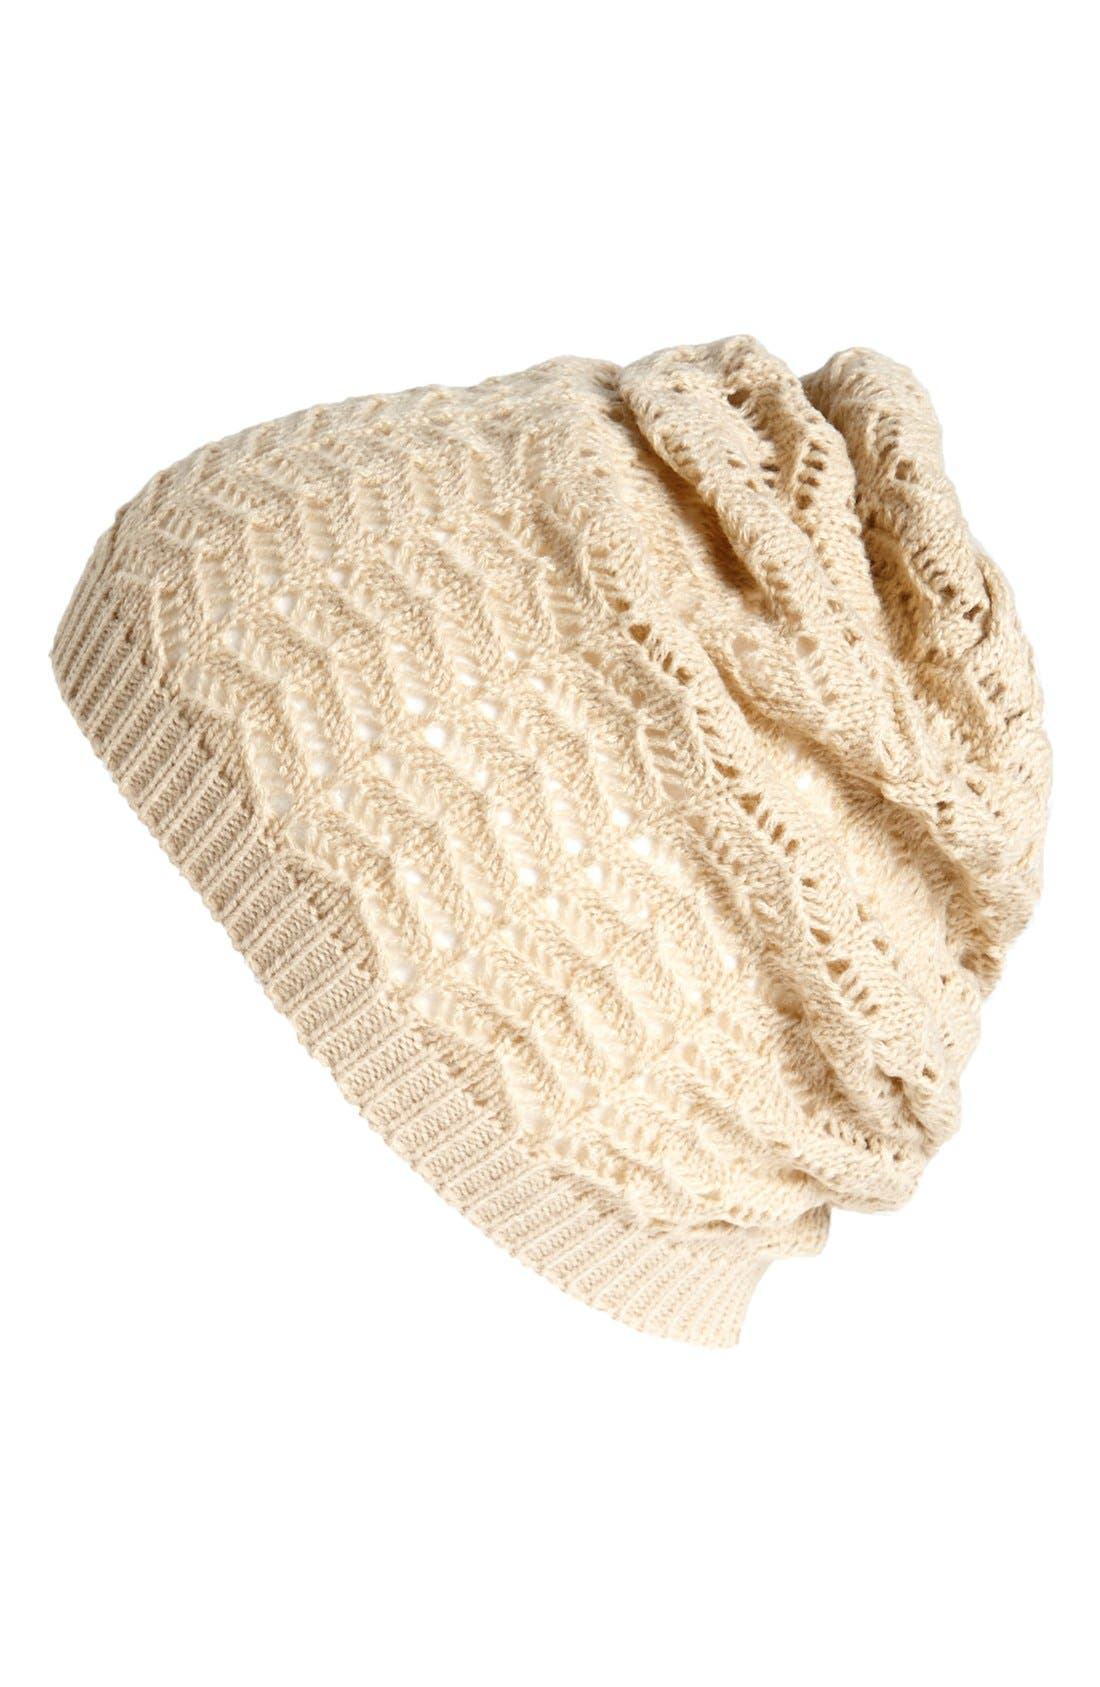 Alternate Image 1 Selected - Lulu Knit Hat (Juniors)